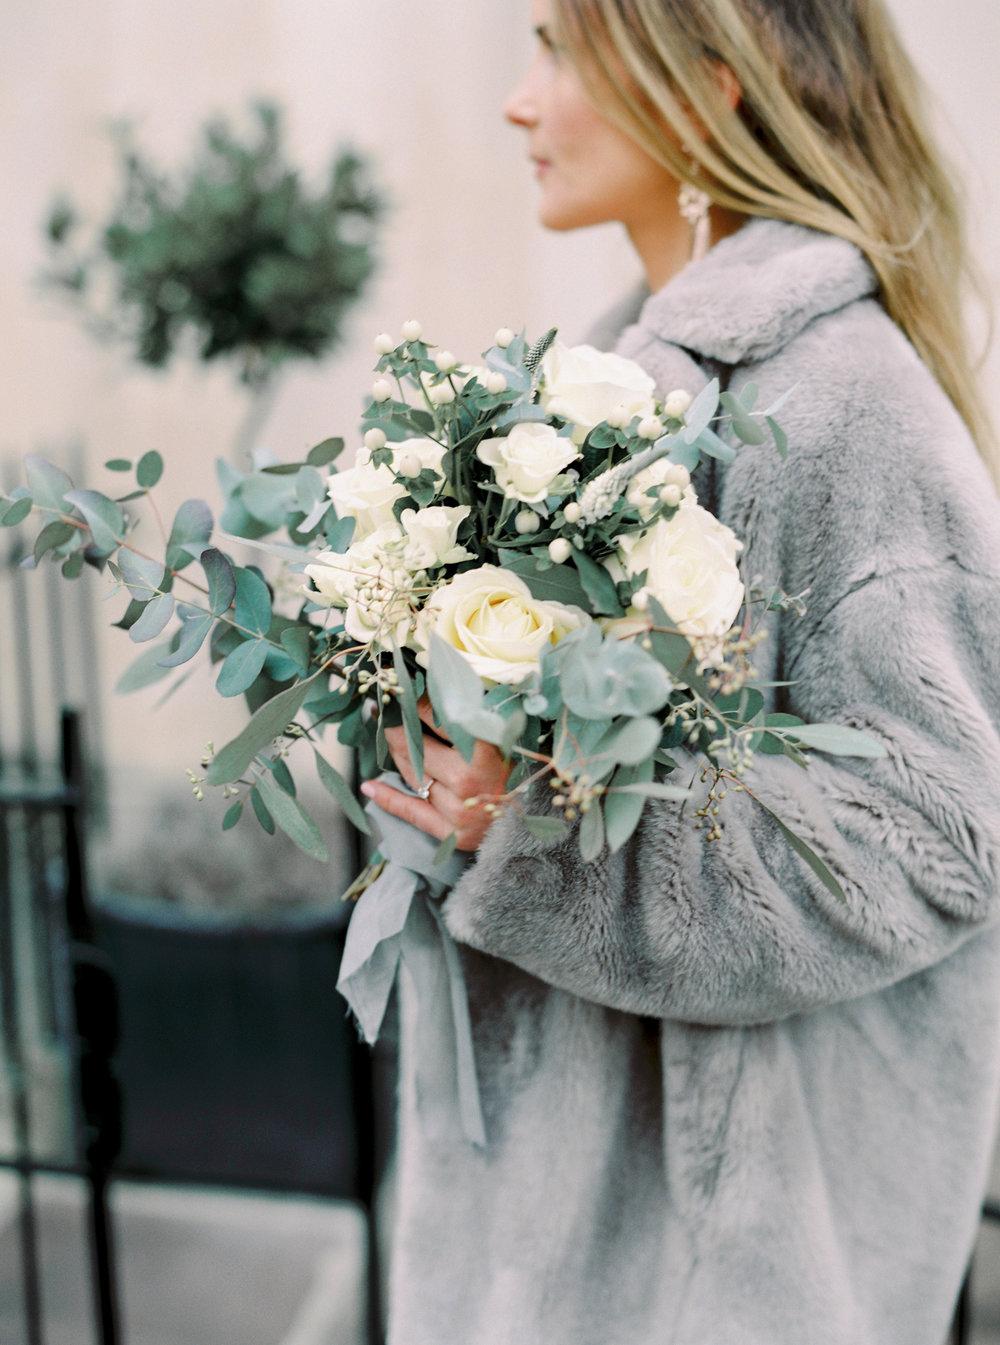 Luxury Wedding Planner UK | Our Chic & Romantic Engagement Shoot in Bath | Katie Julia Photography - 9.JPG